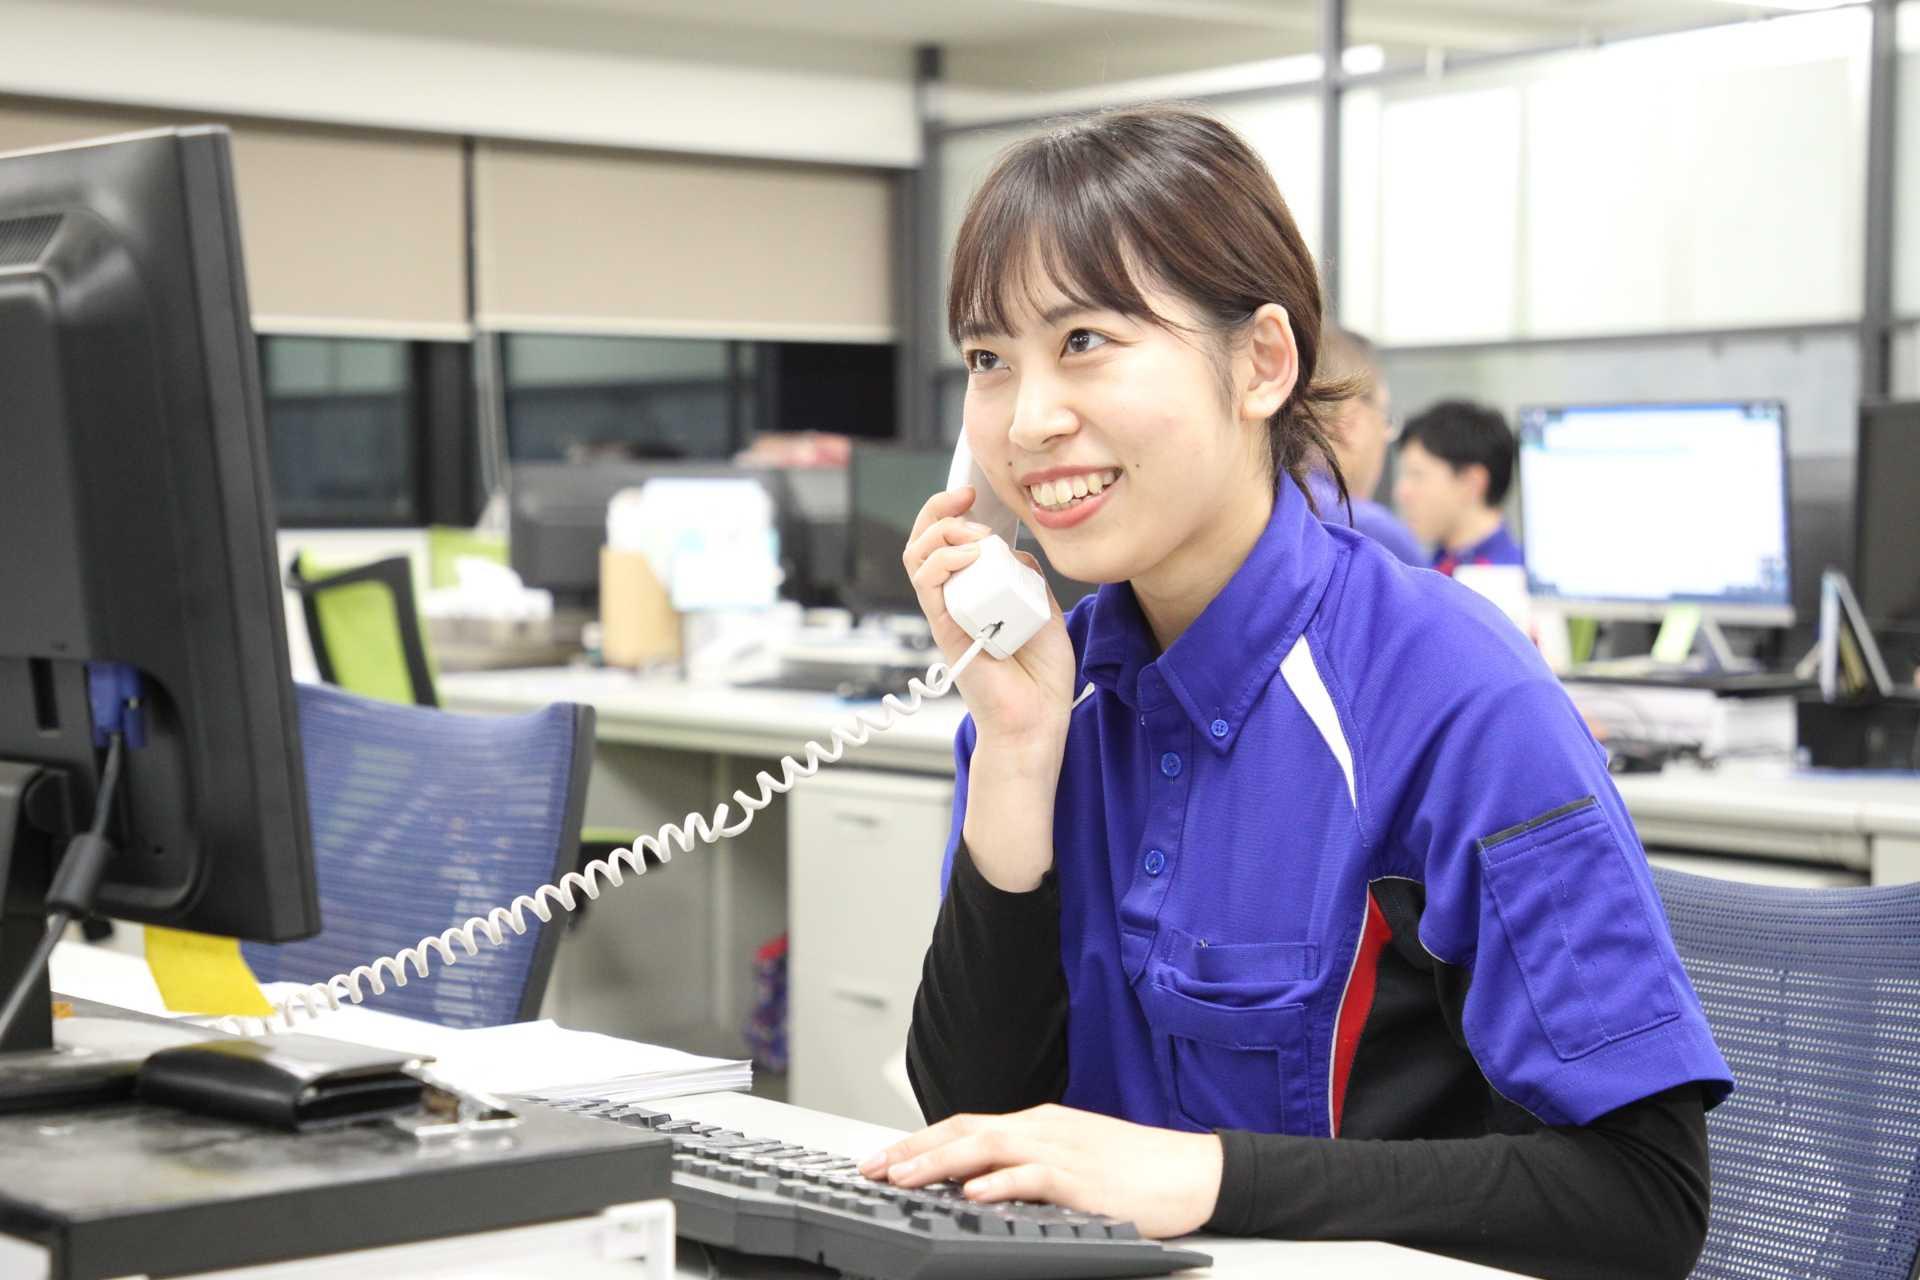 PC操作やTEL対応など一般事務のお仕事です。